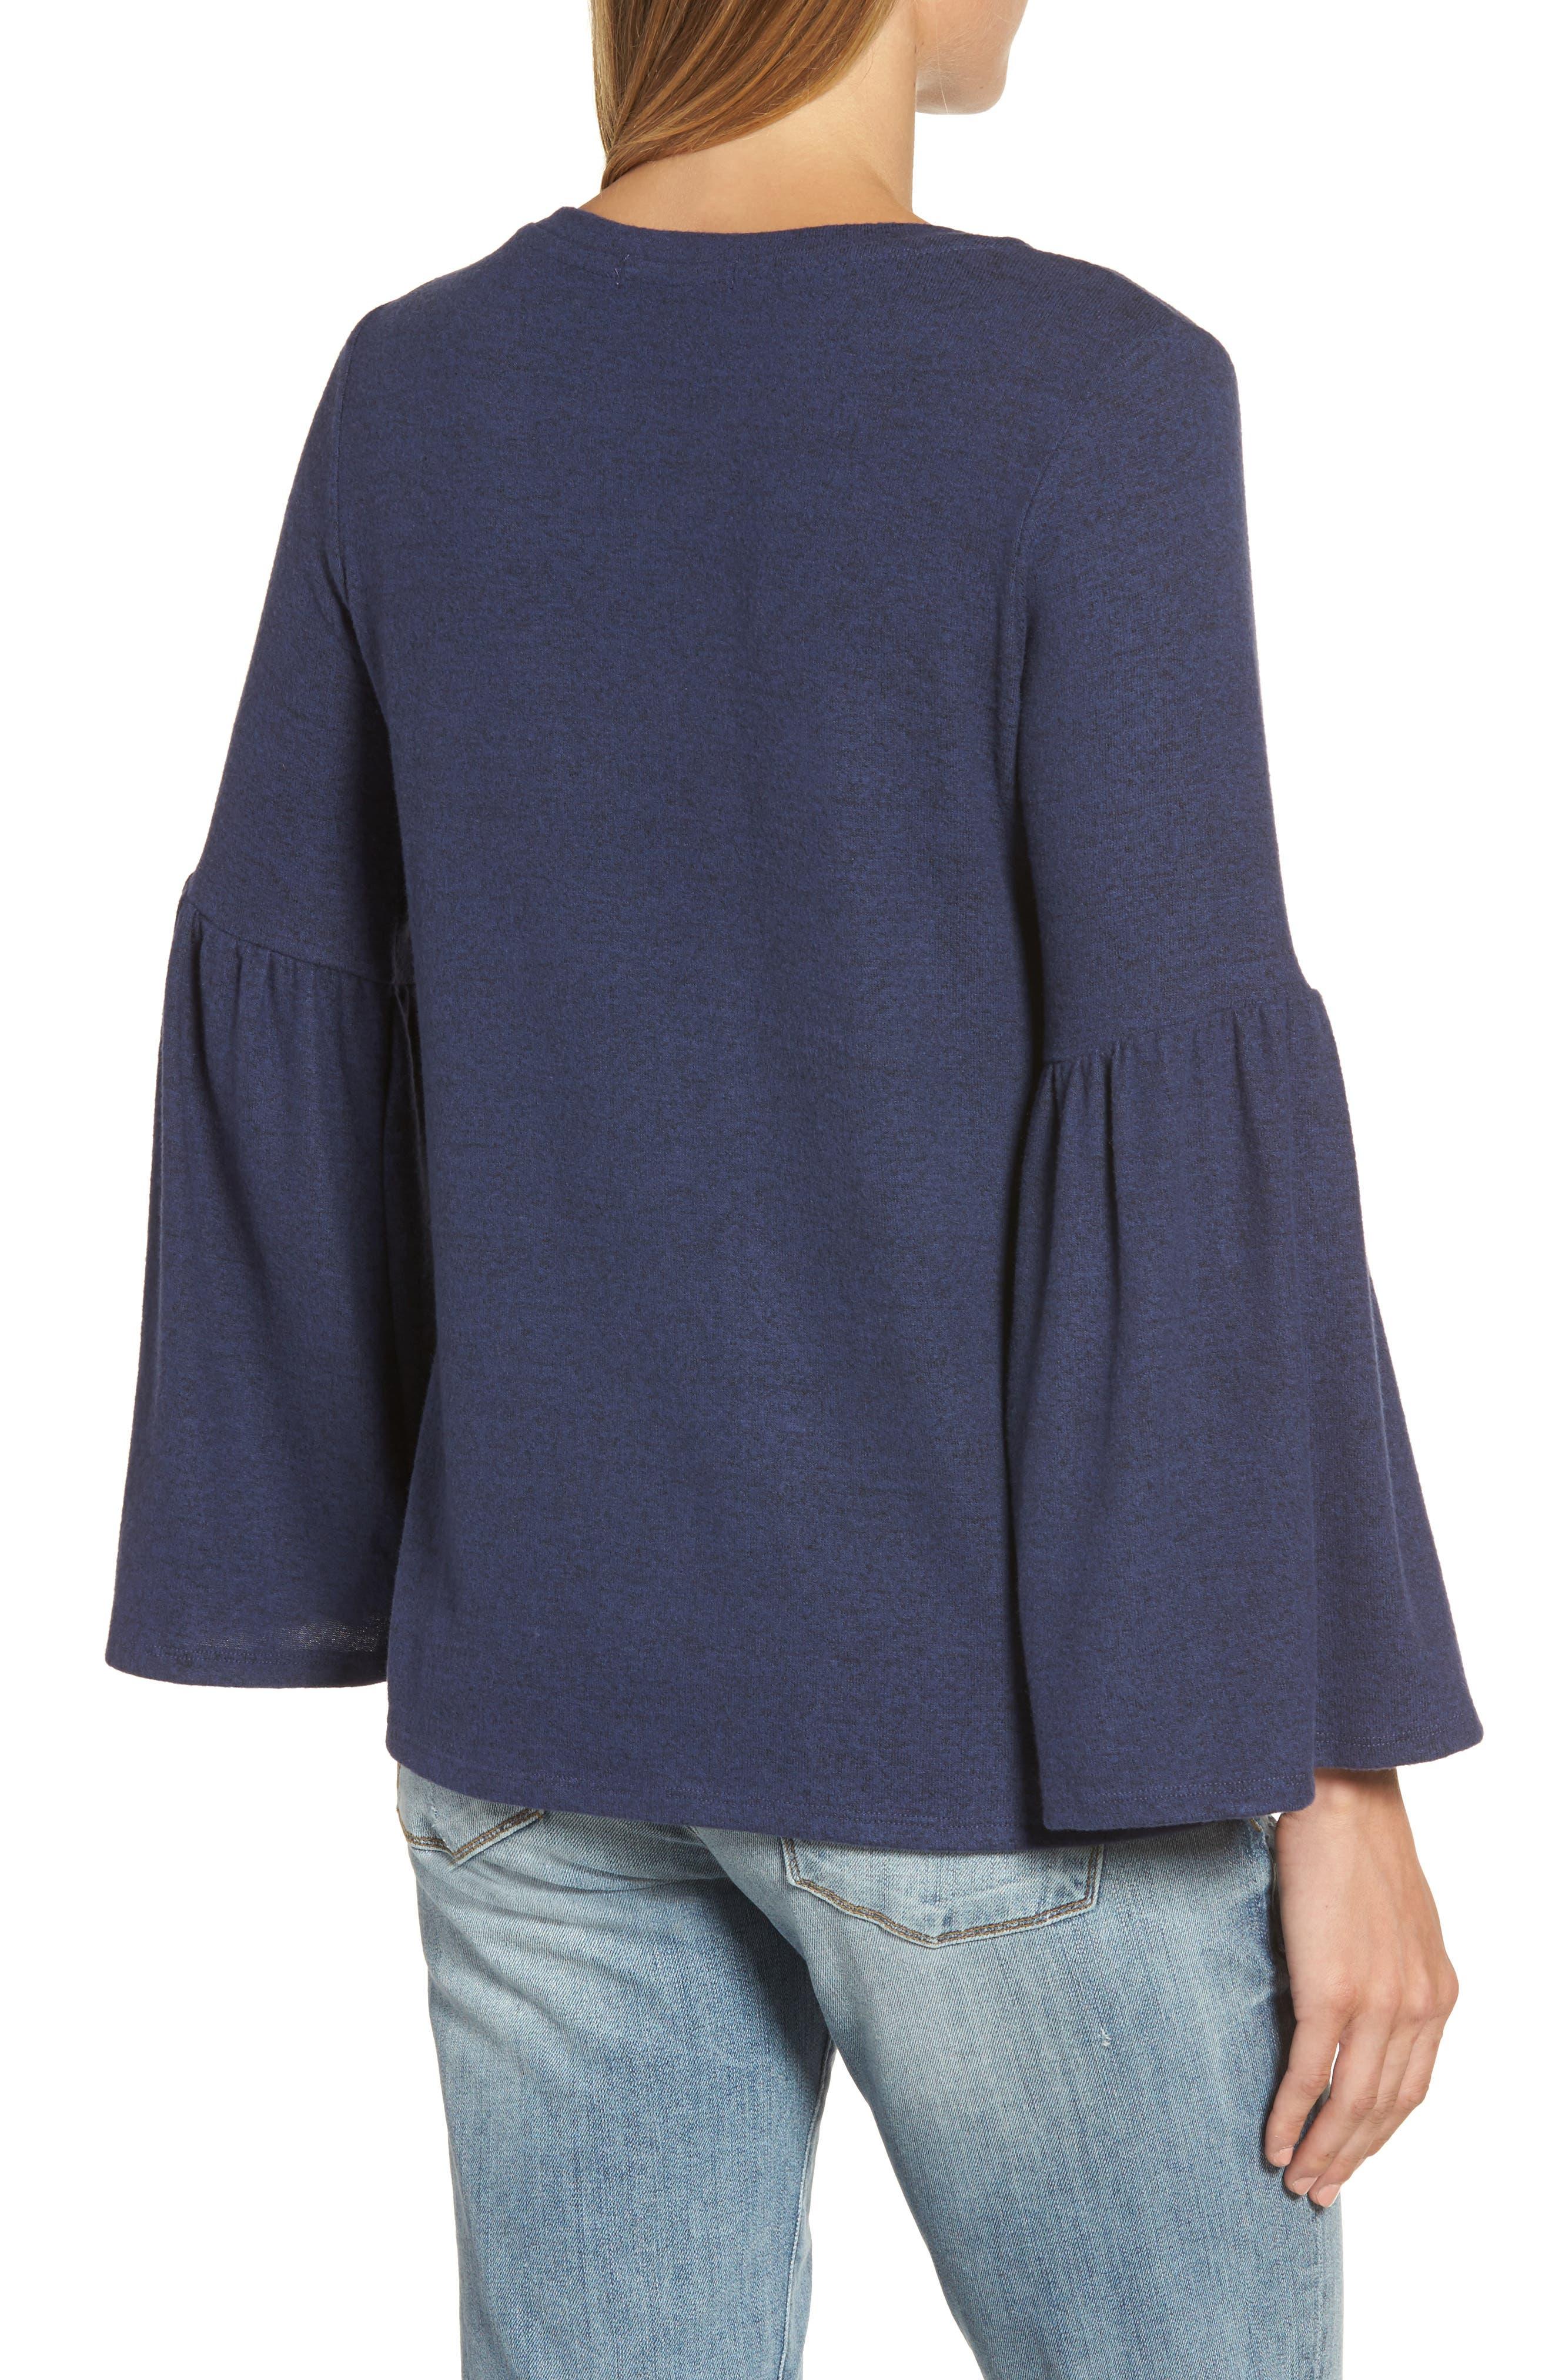 GIBSON,                             Bell Sleeve Cozy Fleece Pullover,                             Alternate thumbnail 2, color,                             415